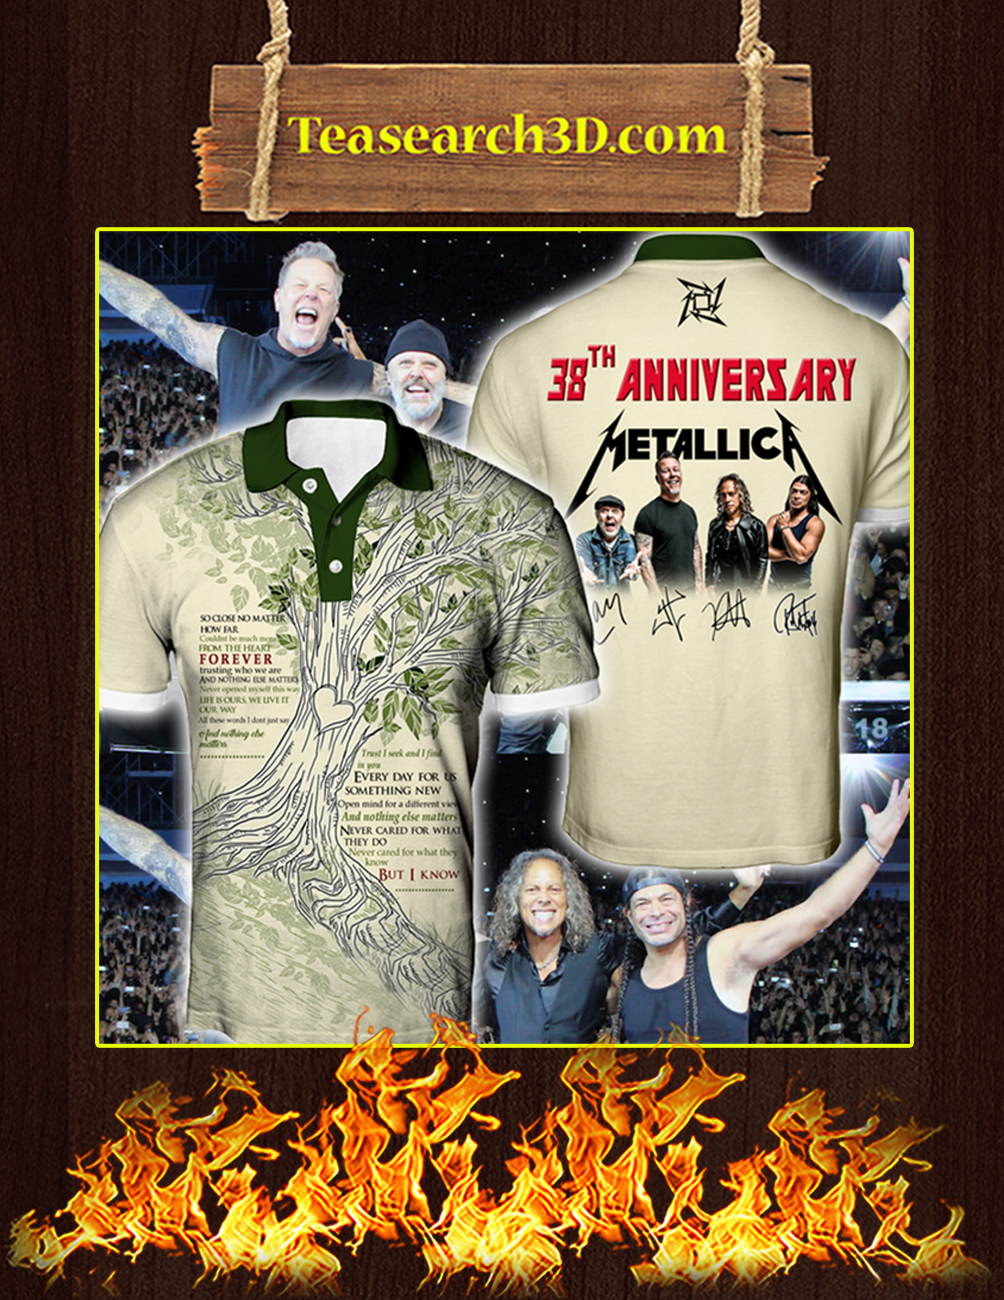 38th Anniversary Metallica Signature polo shirt